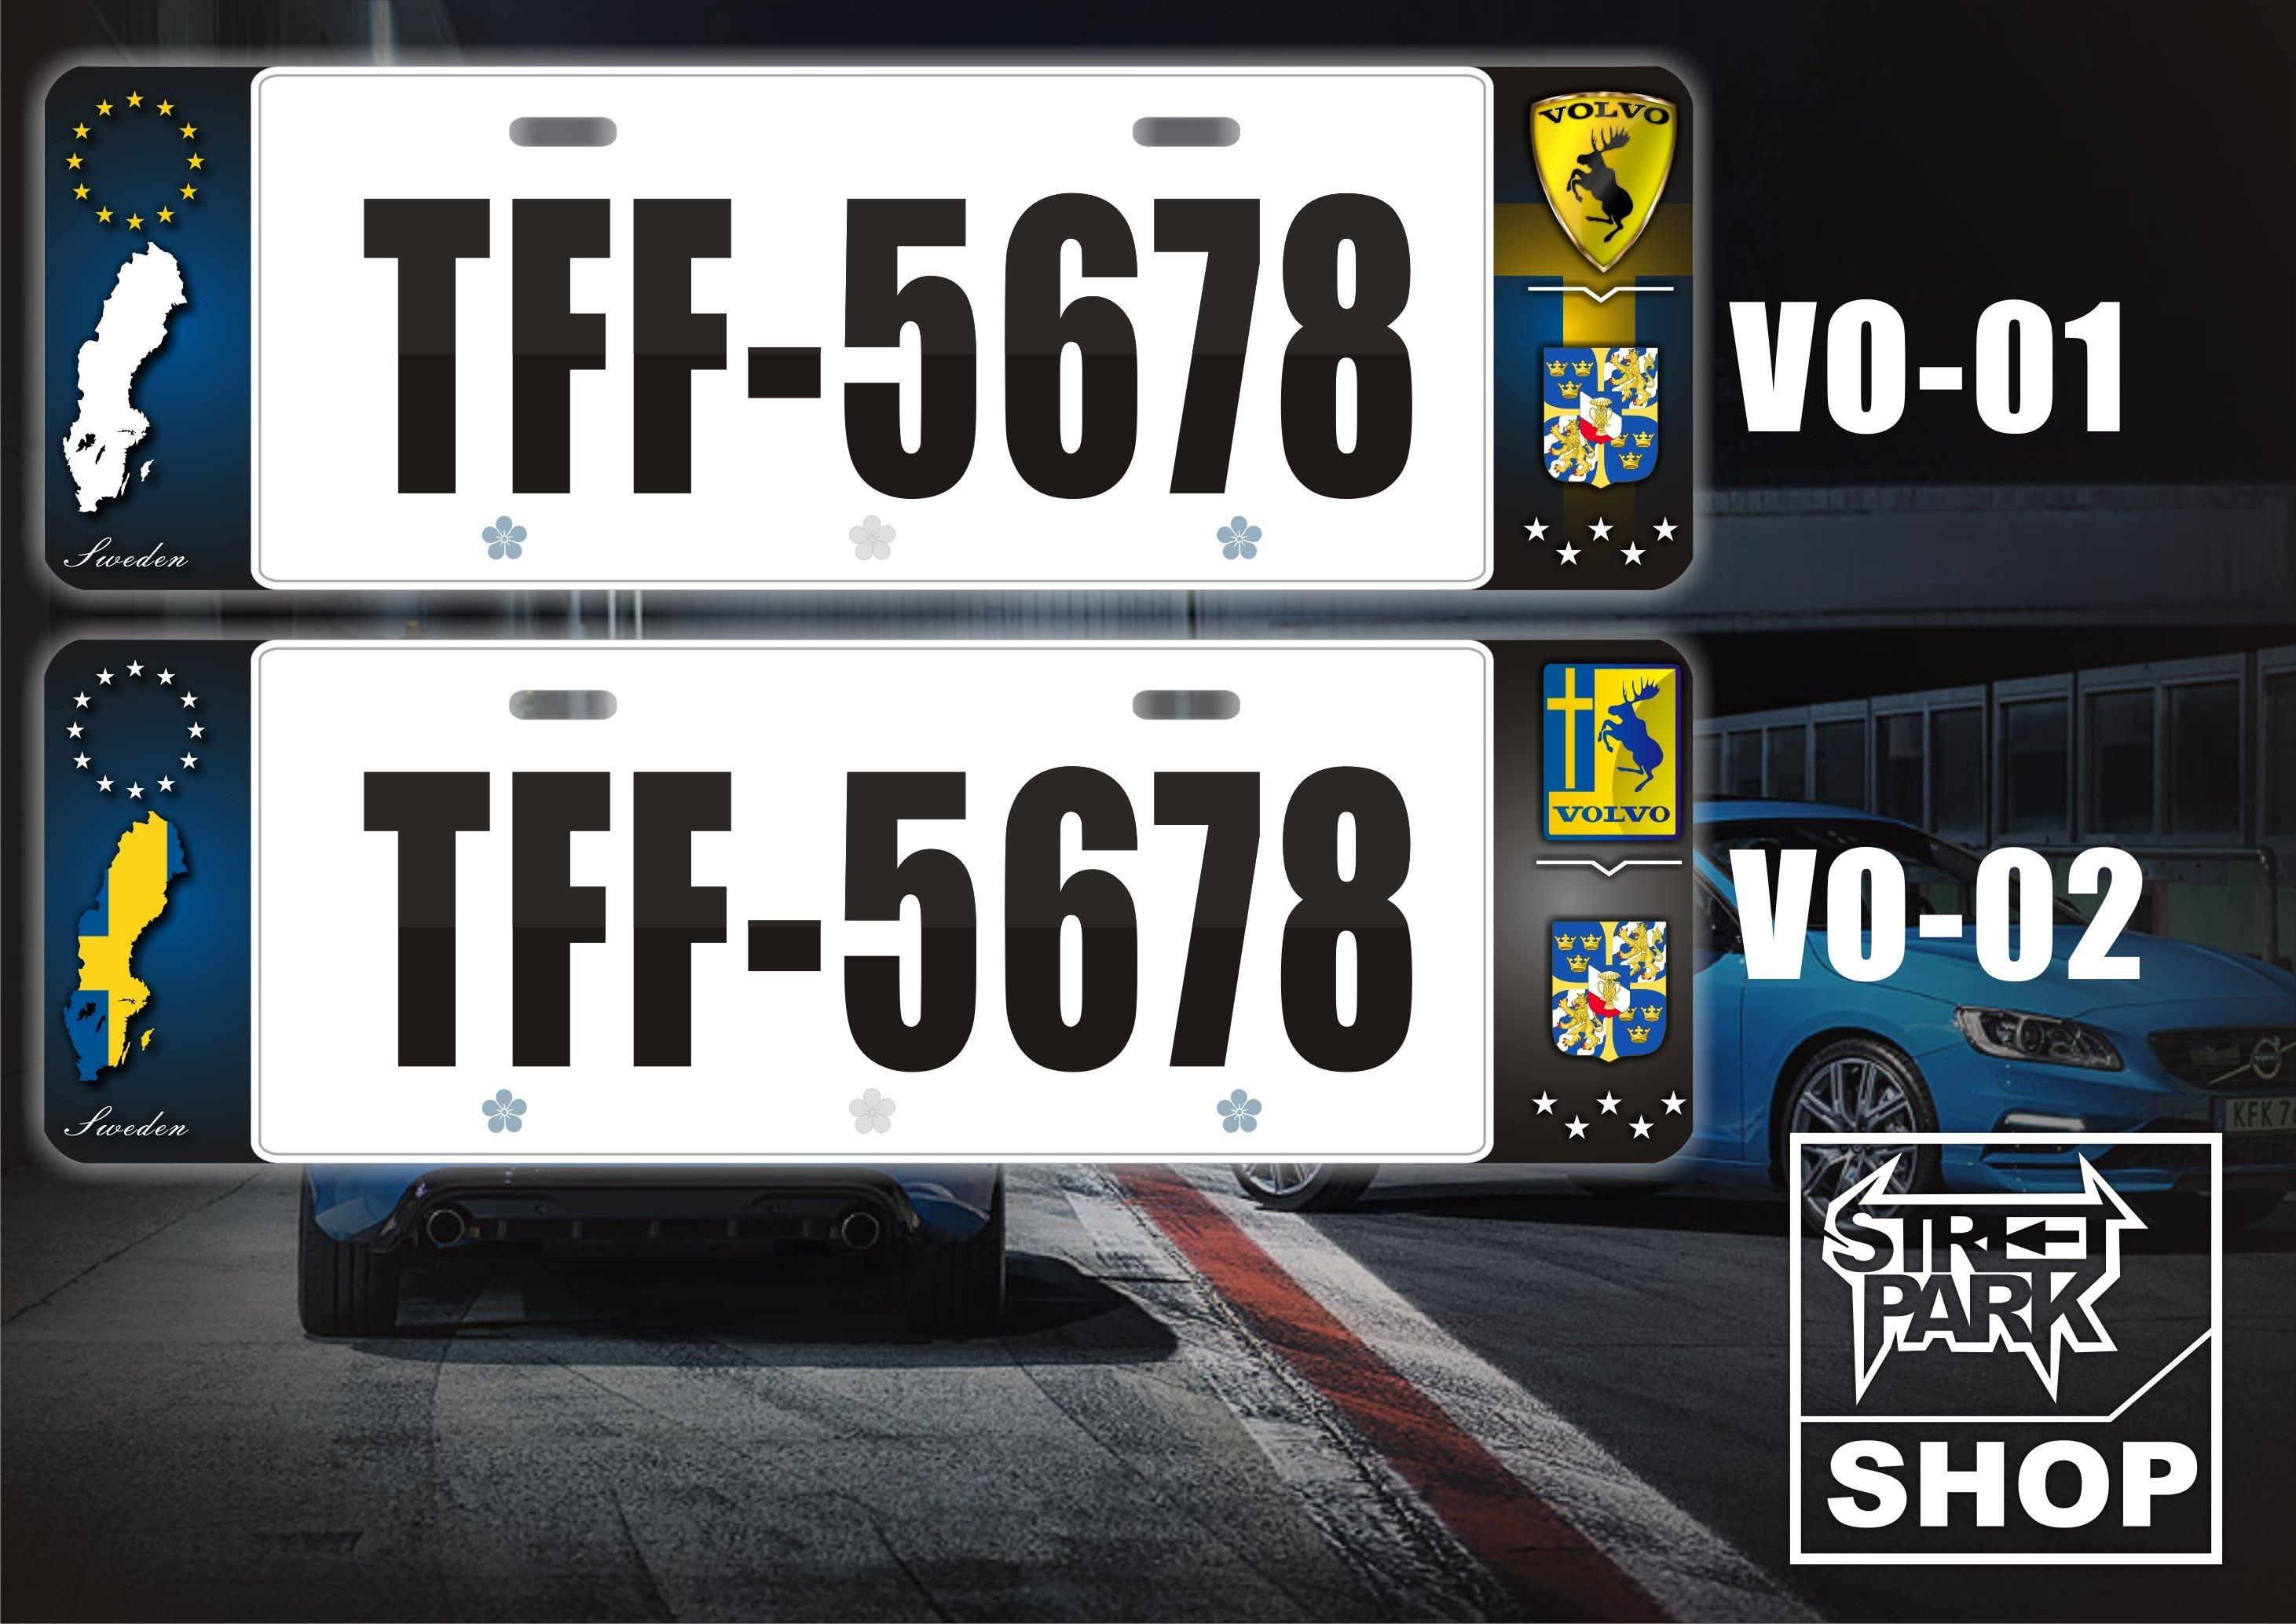 【STREET PARK】訂製 歐盟 車牌裝飾 VOLVO XC40 XC60【原價780$ 特價 580$】